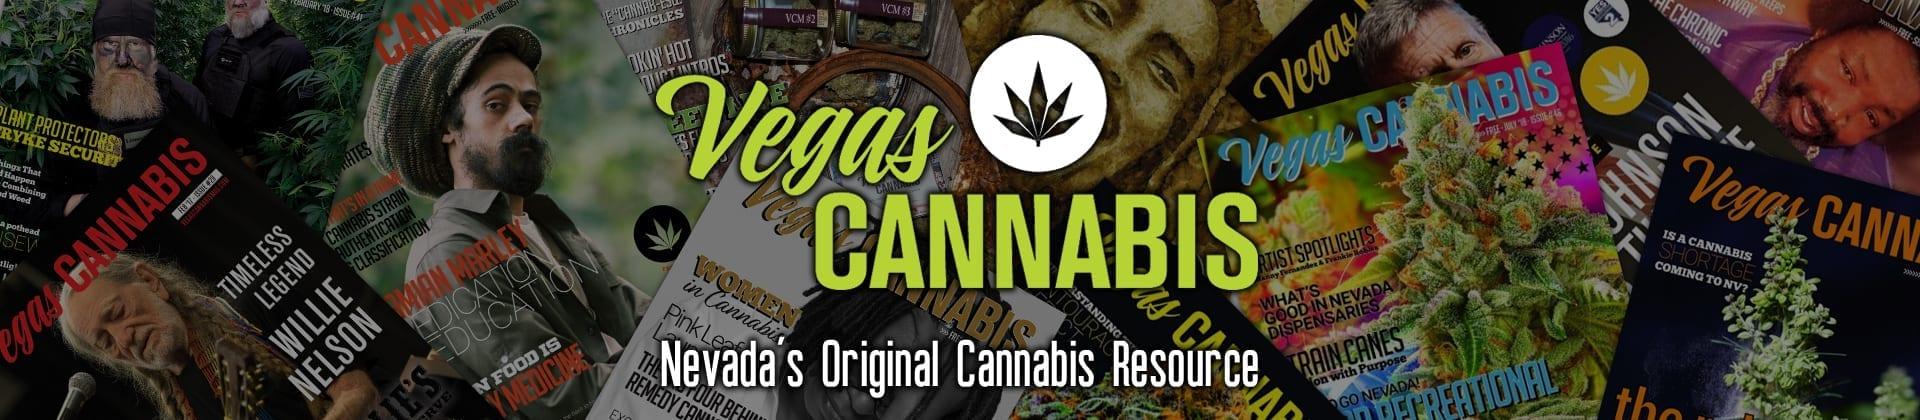 VegasCannabis1920x420